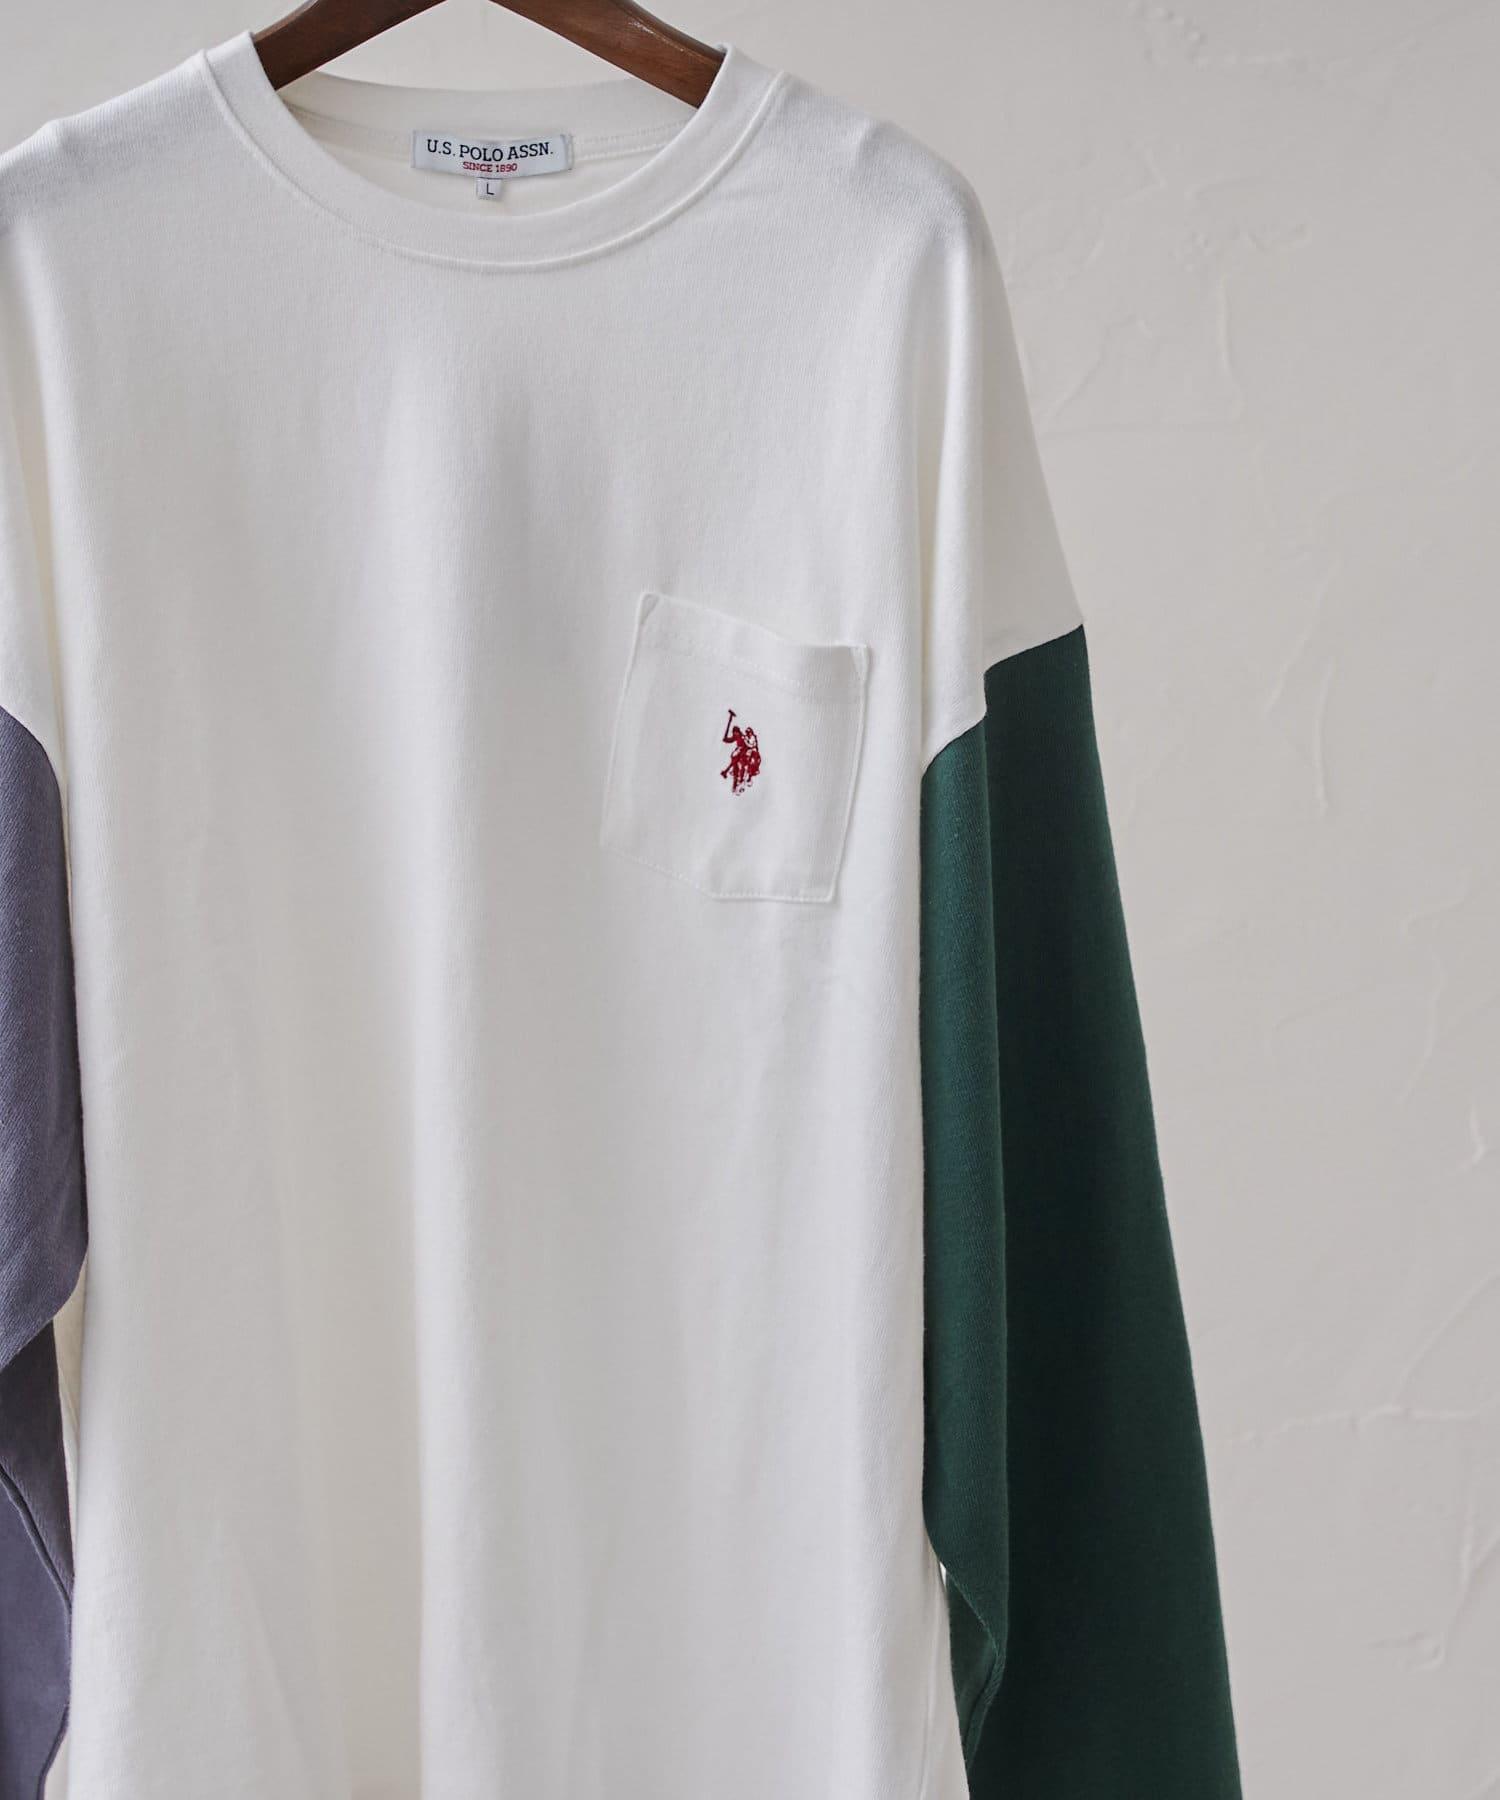 CPCM(シーピーシーエム) 【U.S. POLO ASSN.】胸ポケ1ポイント刺繍ロンT